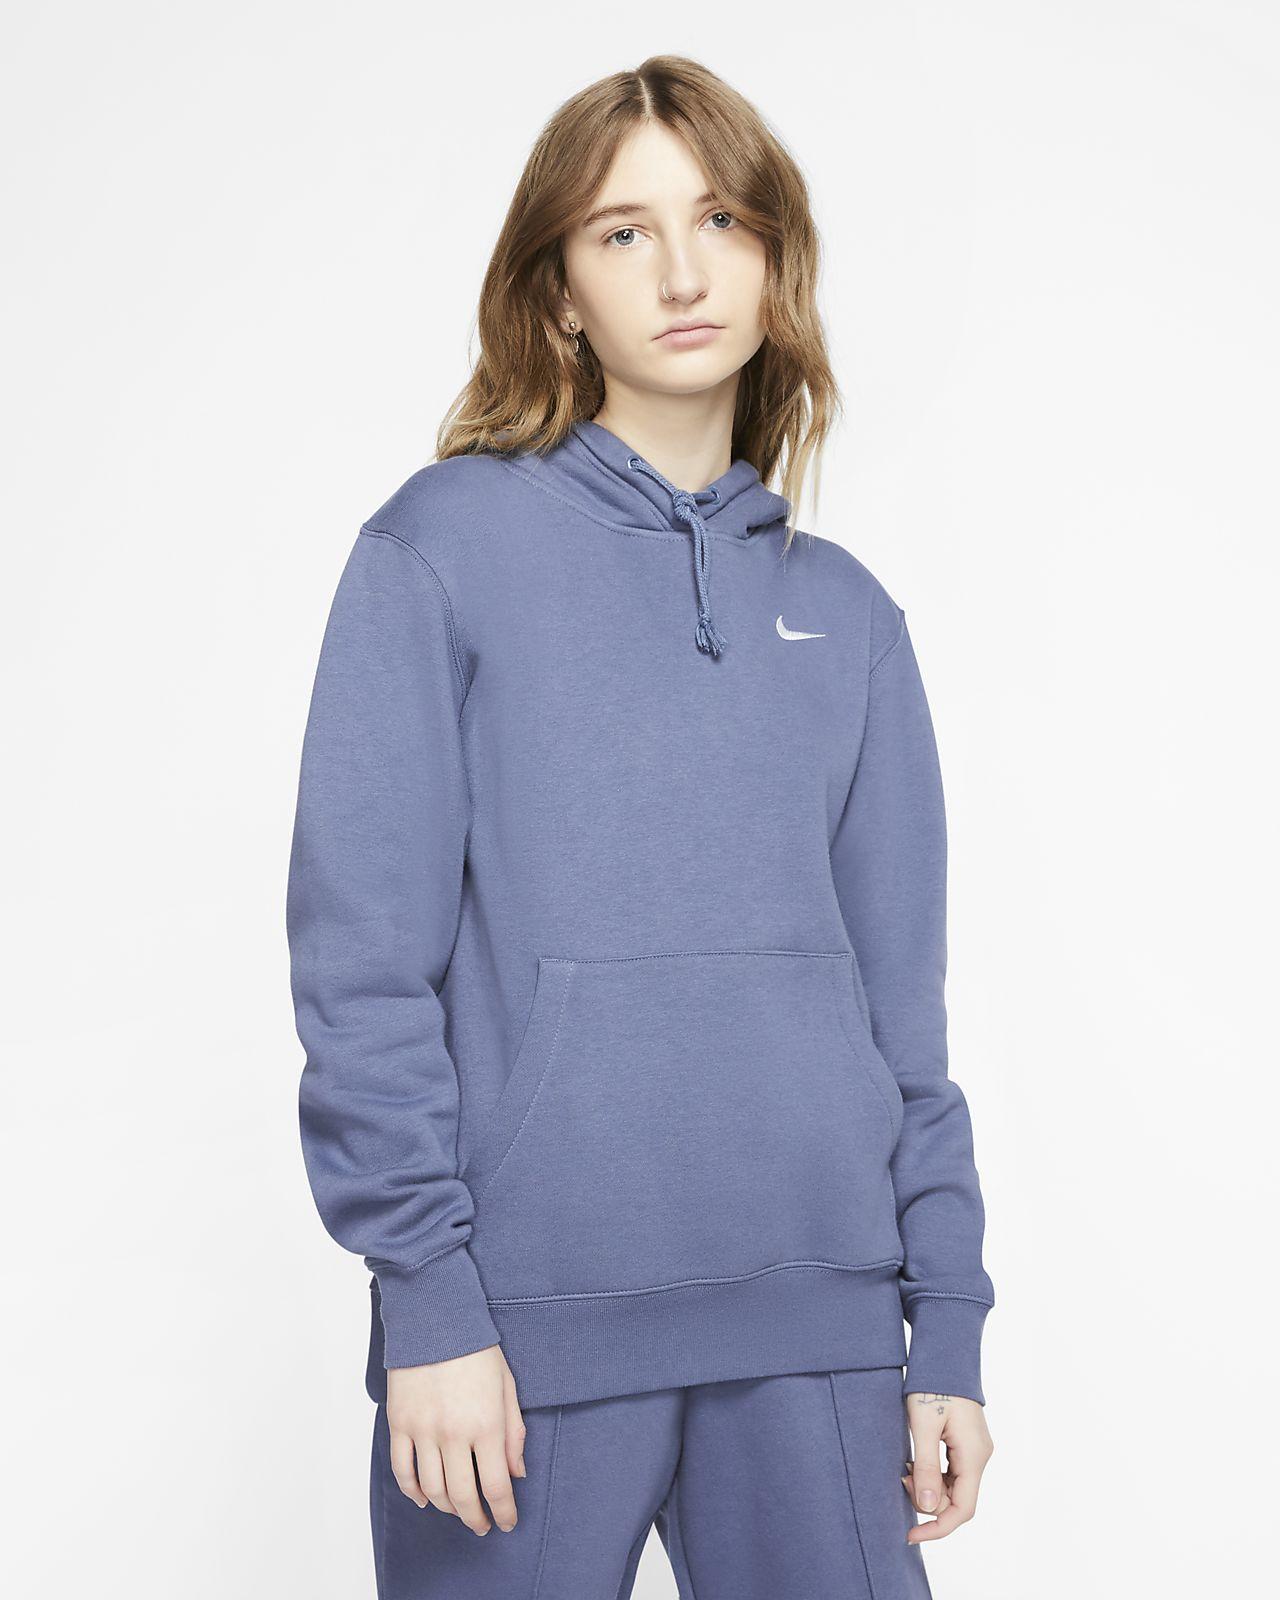 Details about Nike AIR WINDRUNNER Boys Girls UK Size 5 Black White Shoe Run